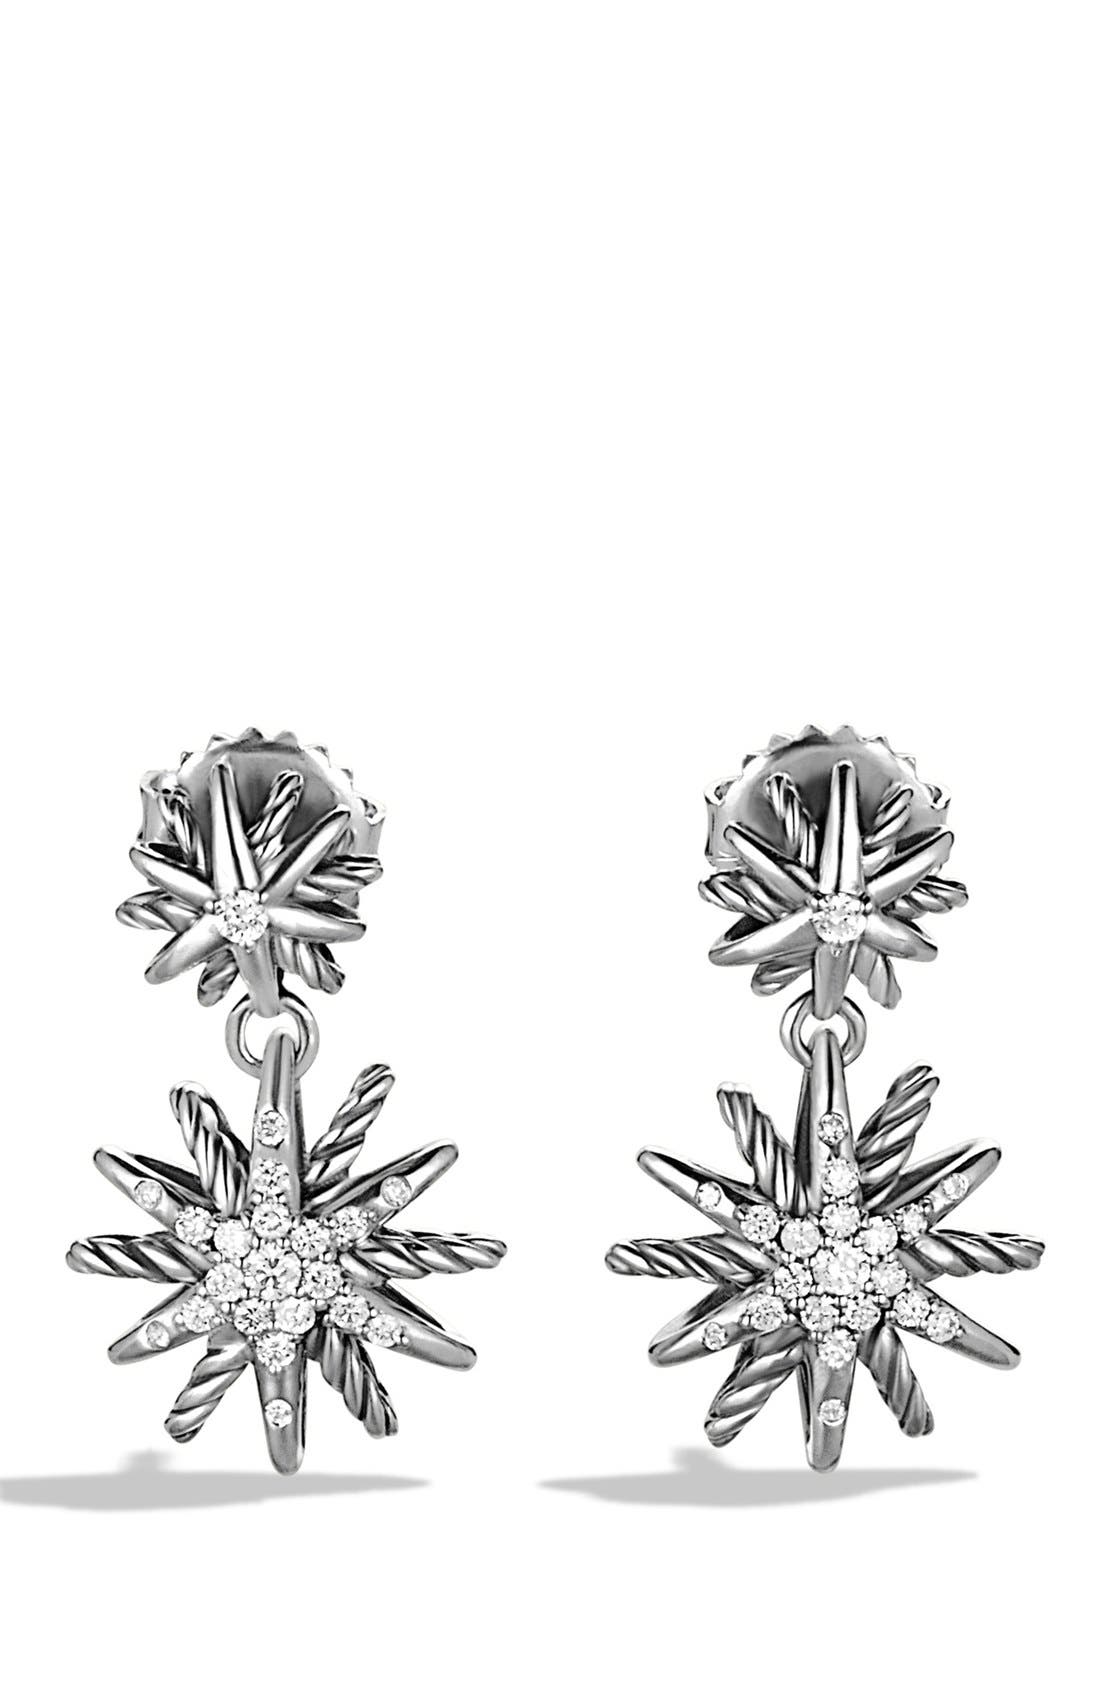 'Starburst' Double-Drop Earrings with Diamonds,                             Main thumbnail 1, color,                             DIAMOND